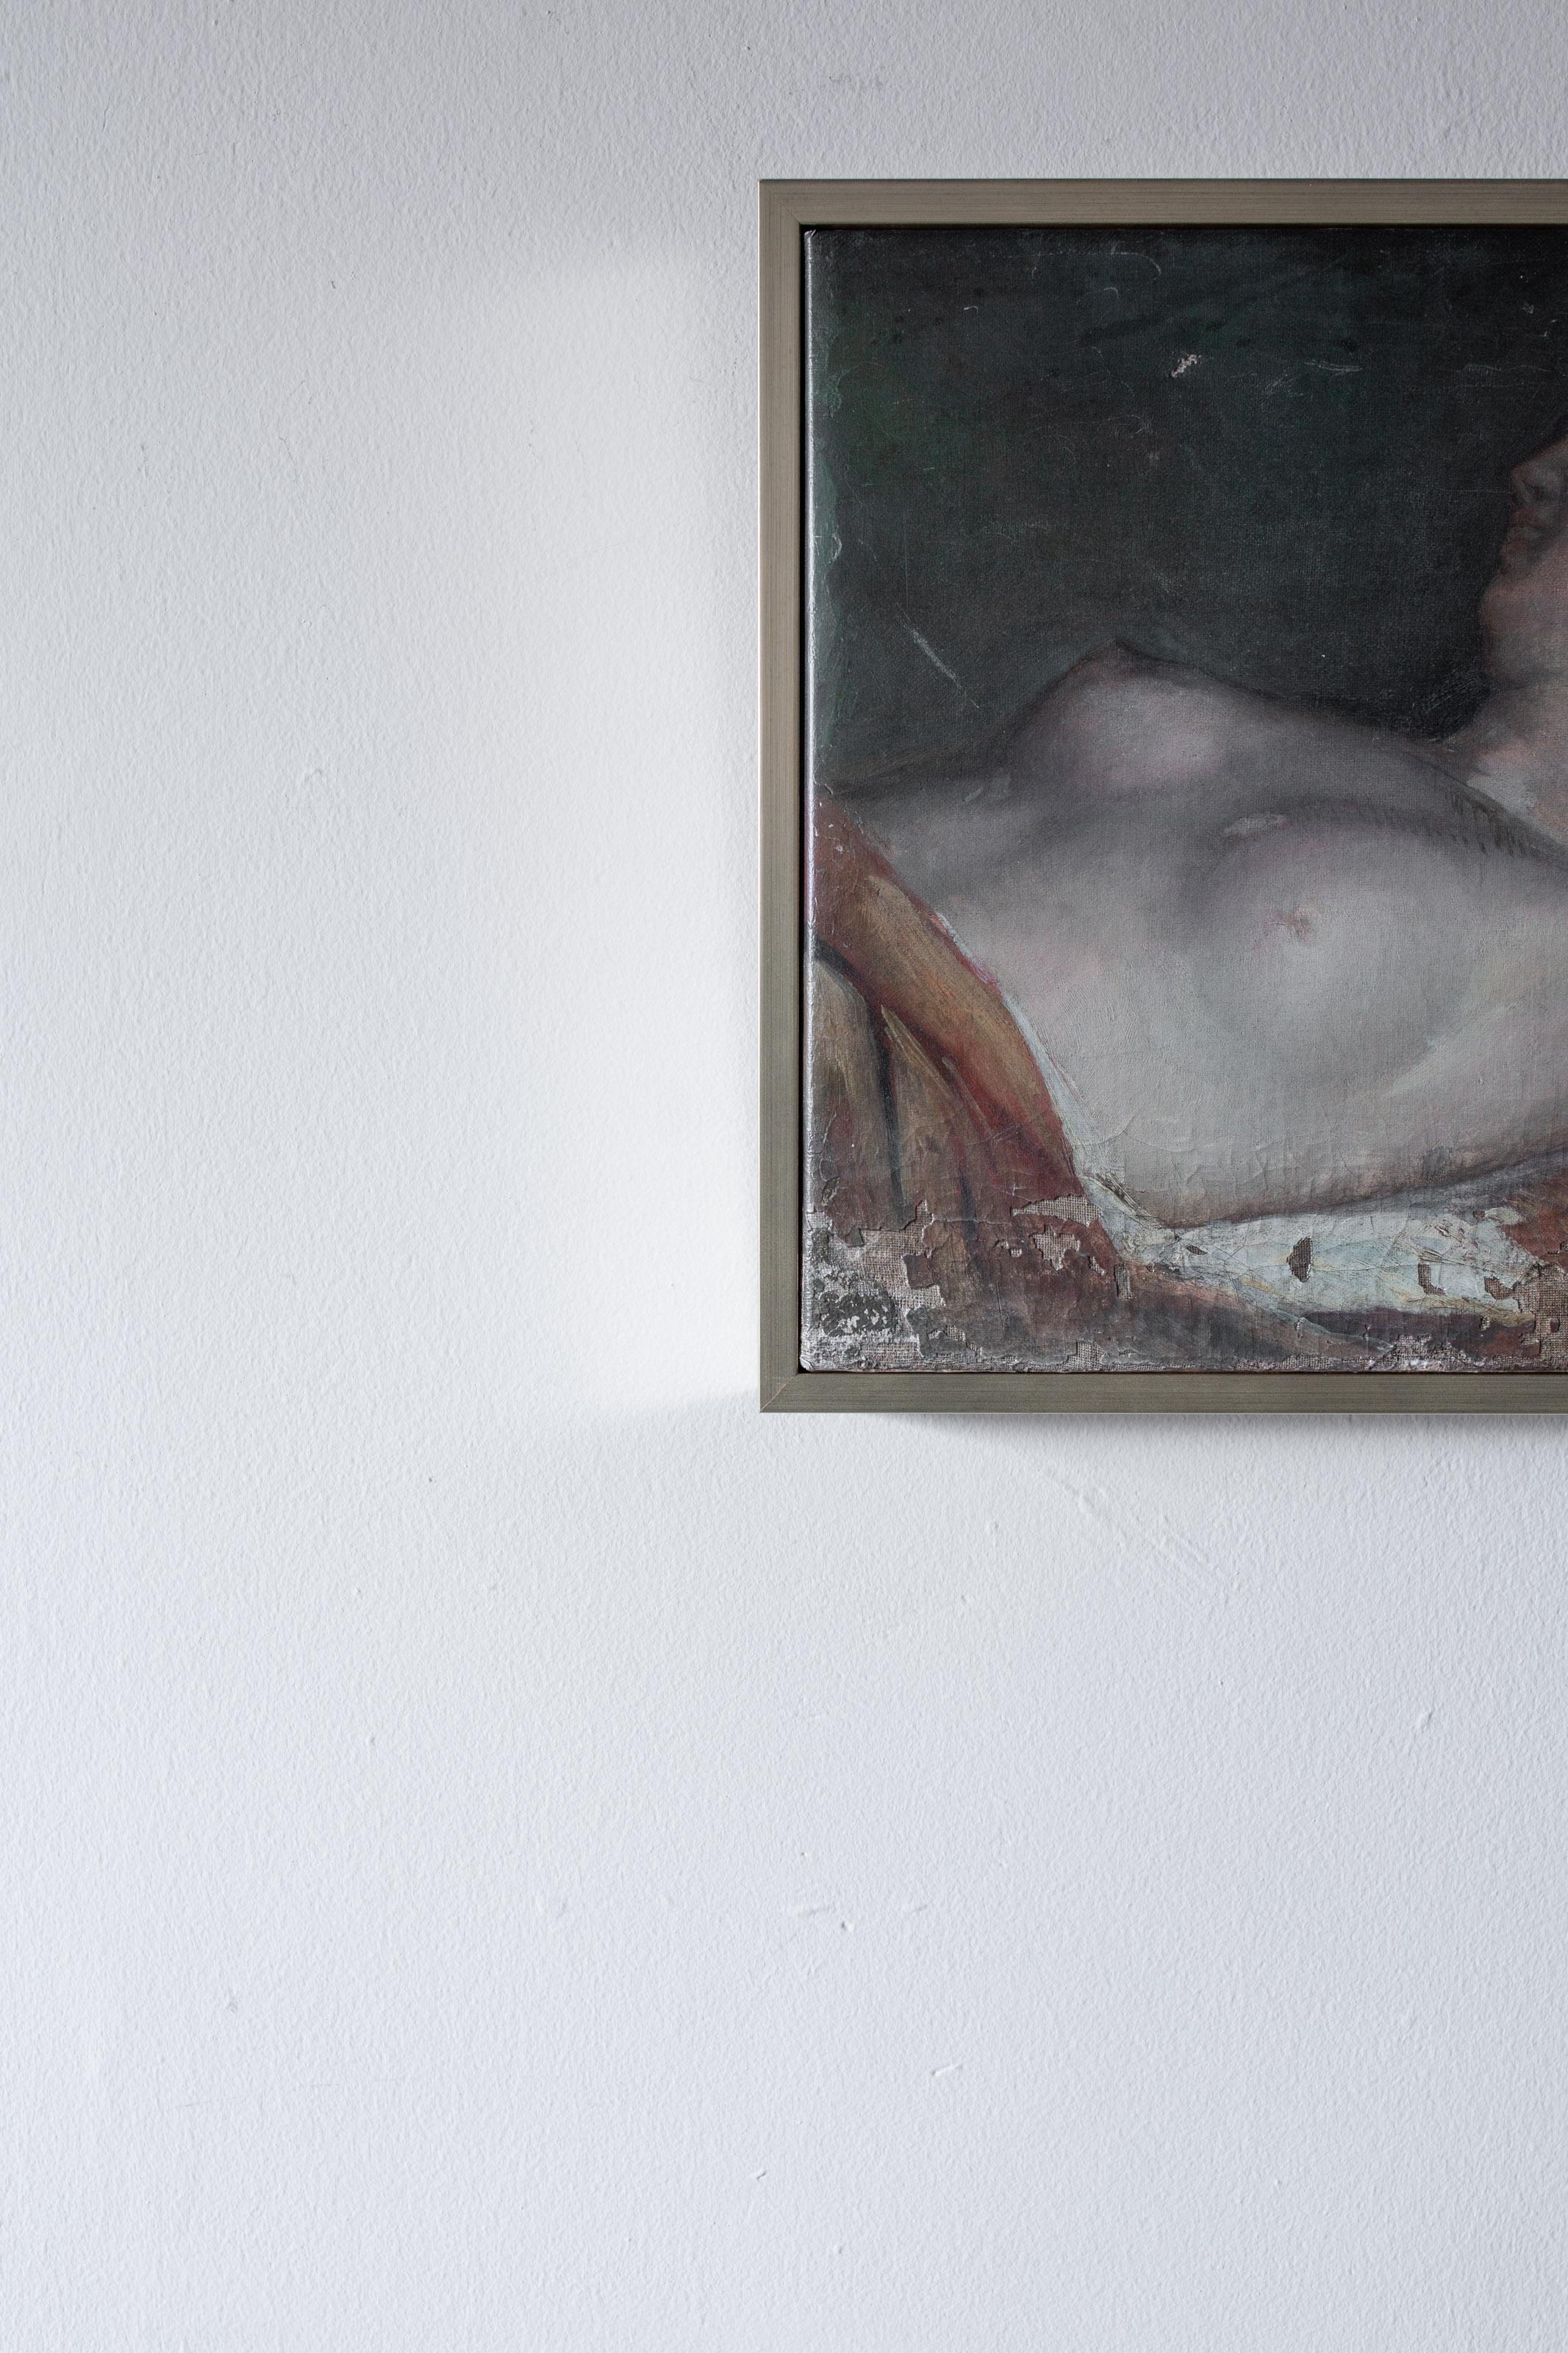 Democratizing Art ⏤ In Conversation with Portia de Rossi & Slater Herman of General Public